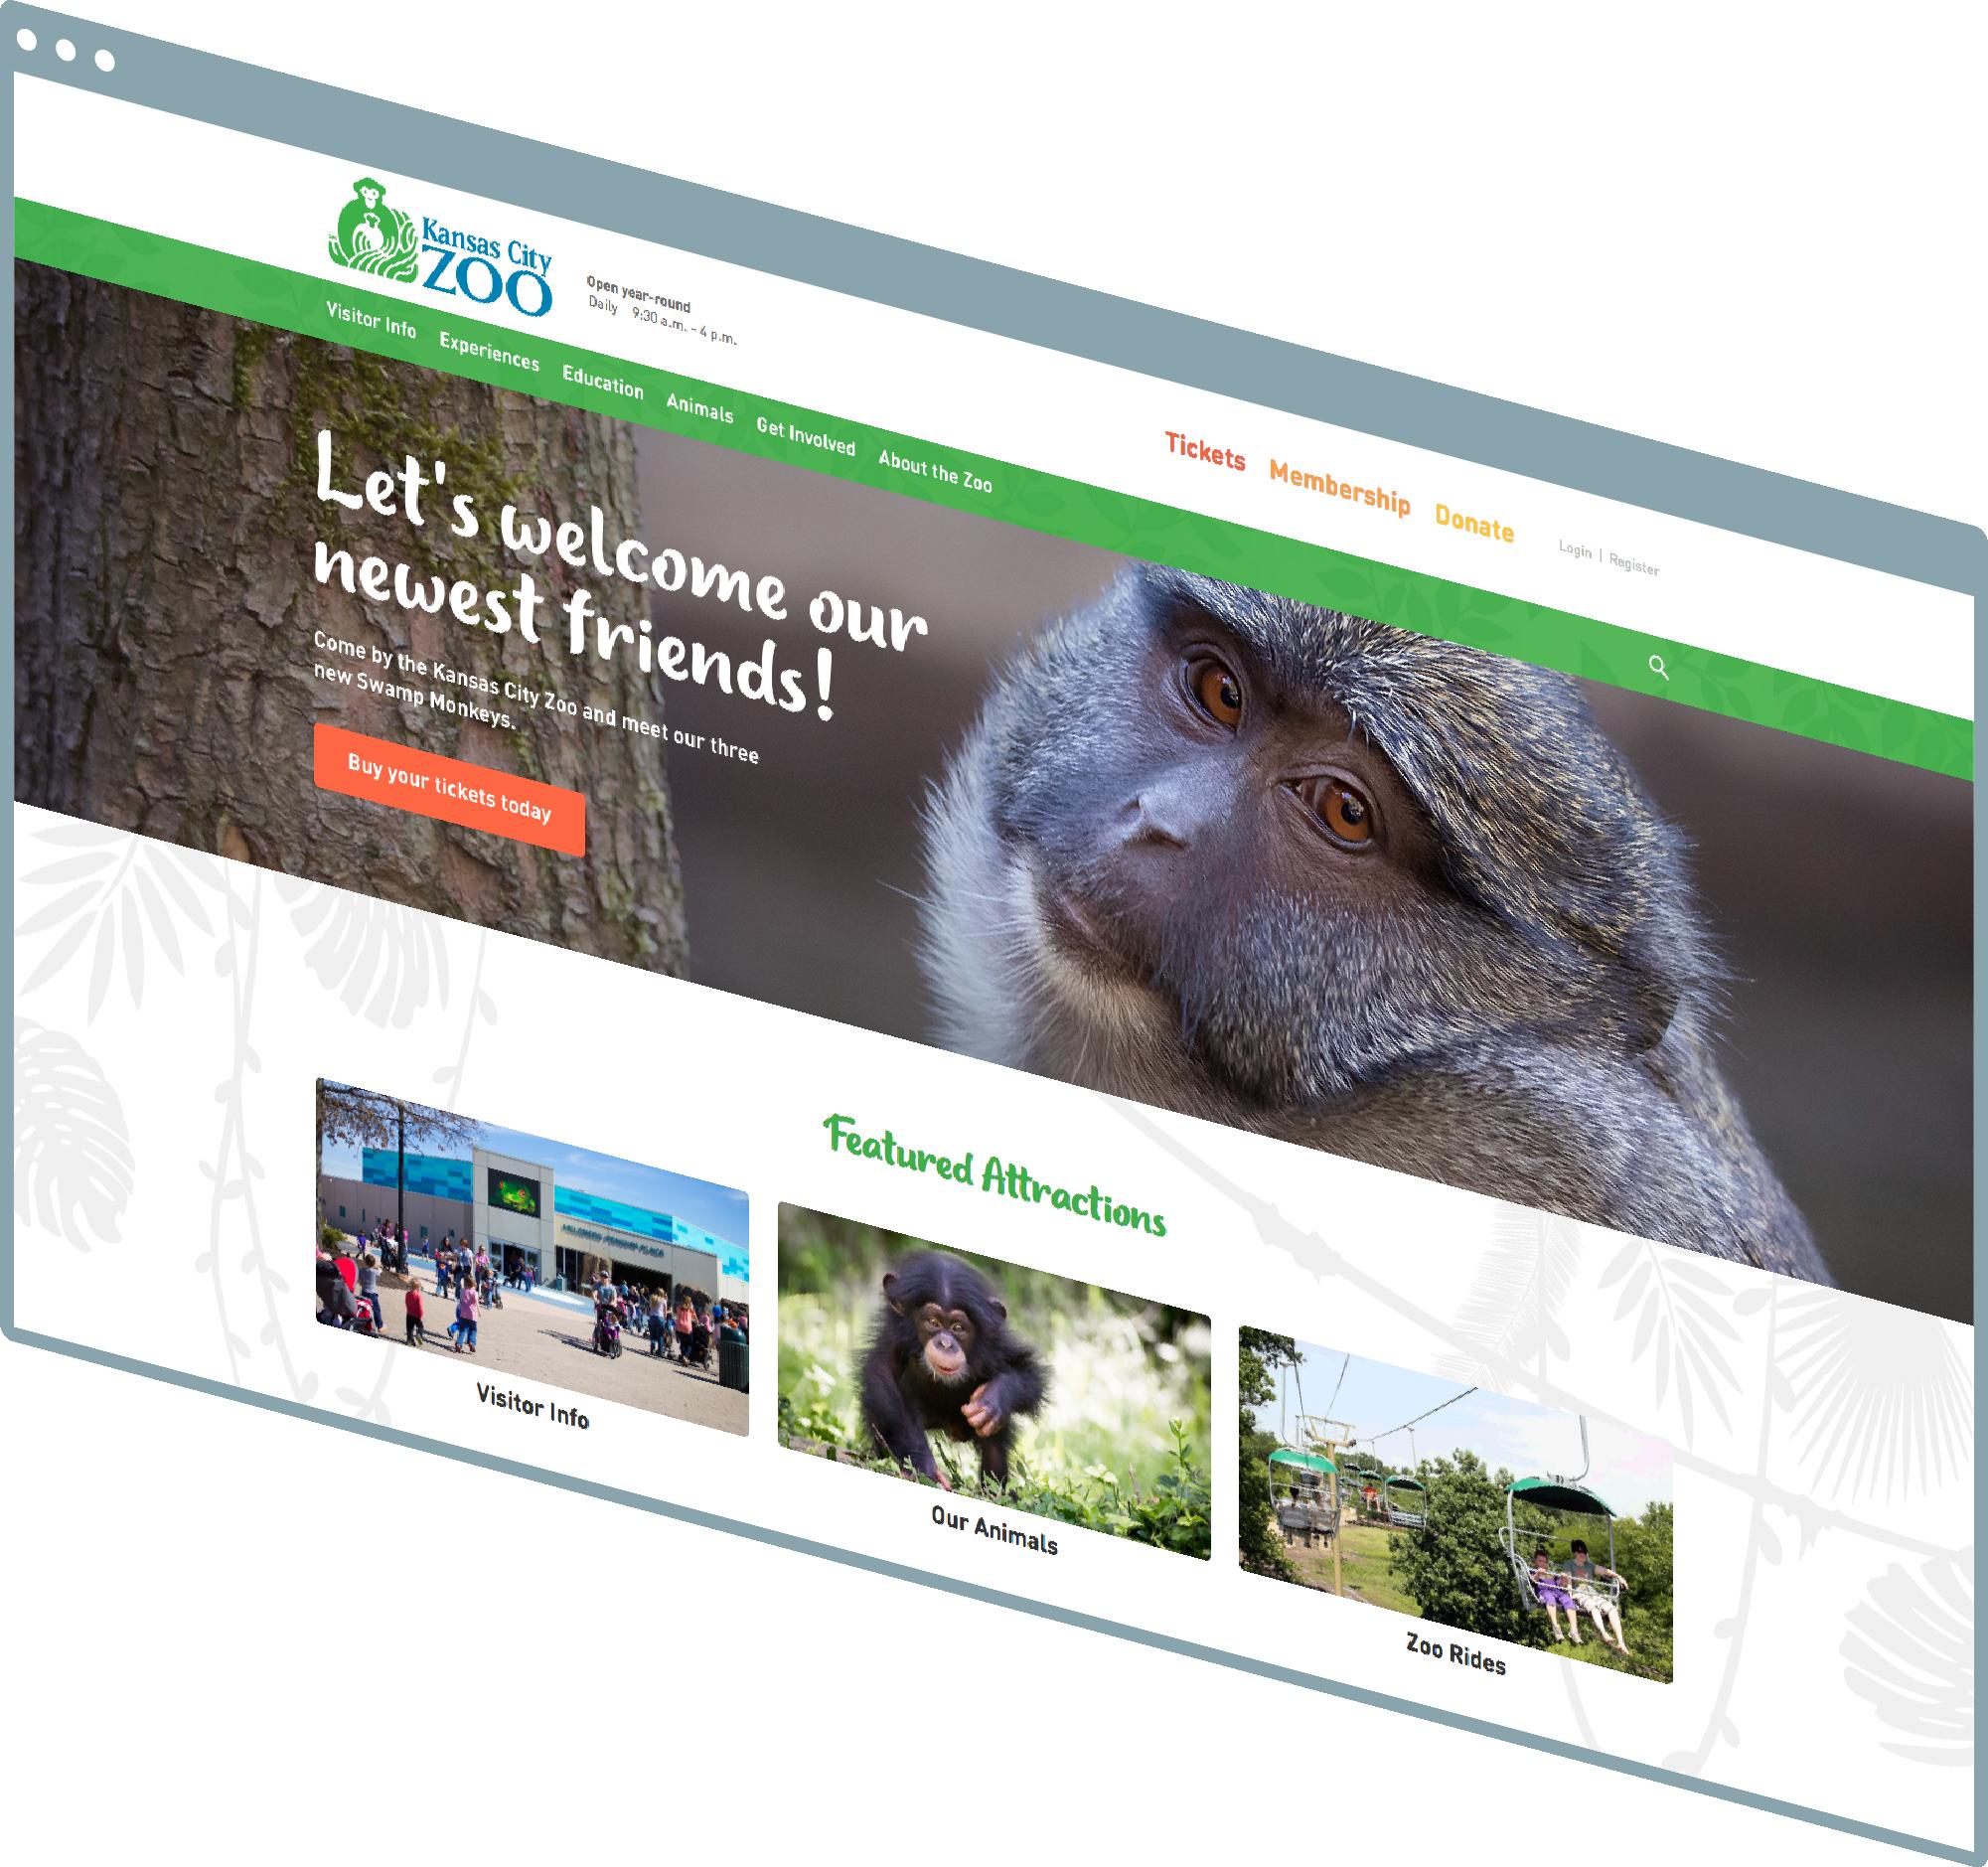 Kansas City Web Design And Kansas City Web Development Portfolio - Kansas City Zoo